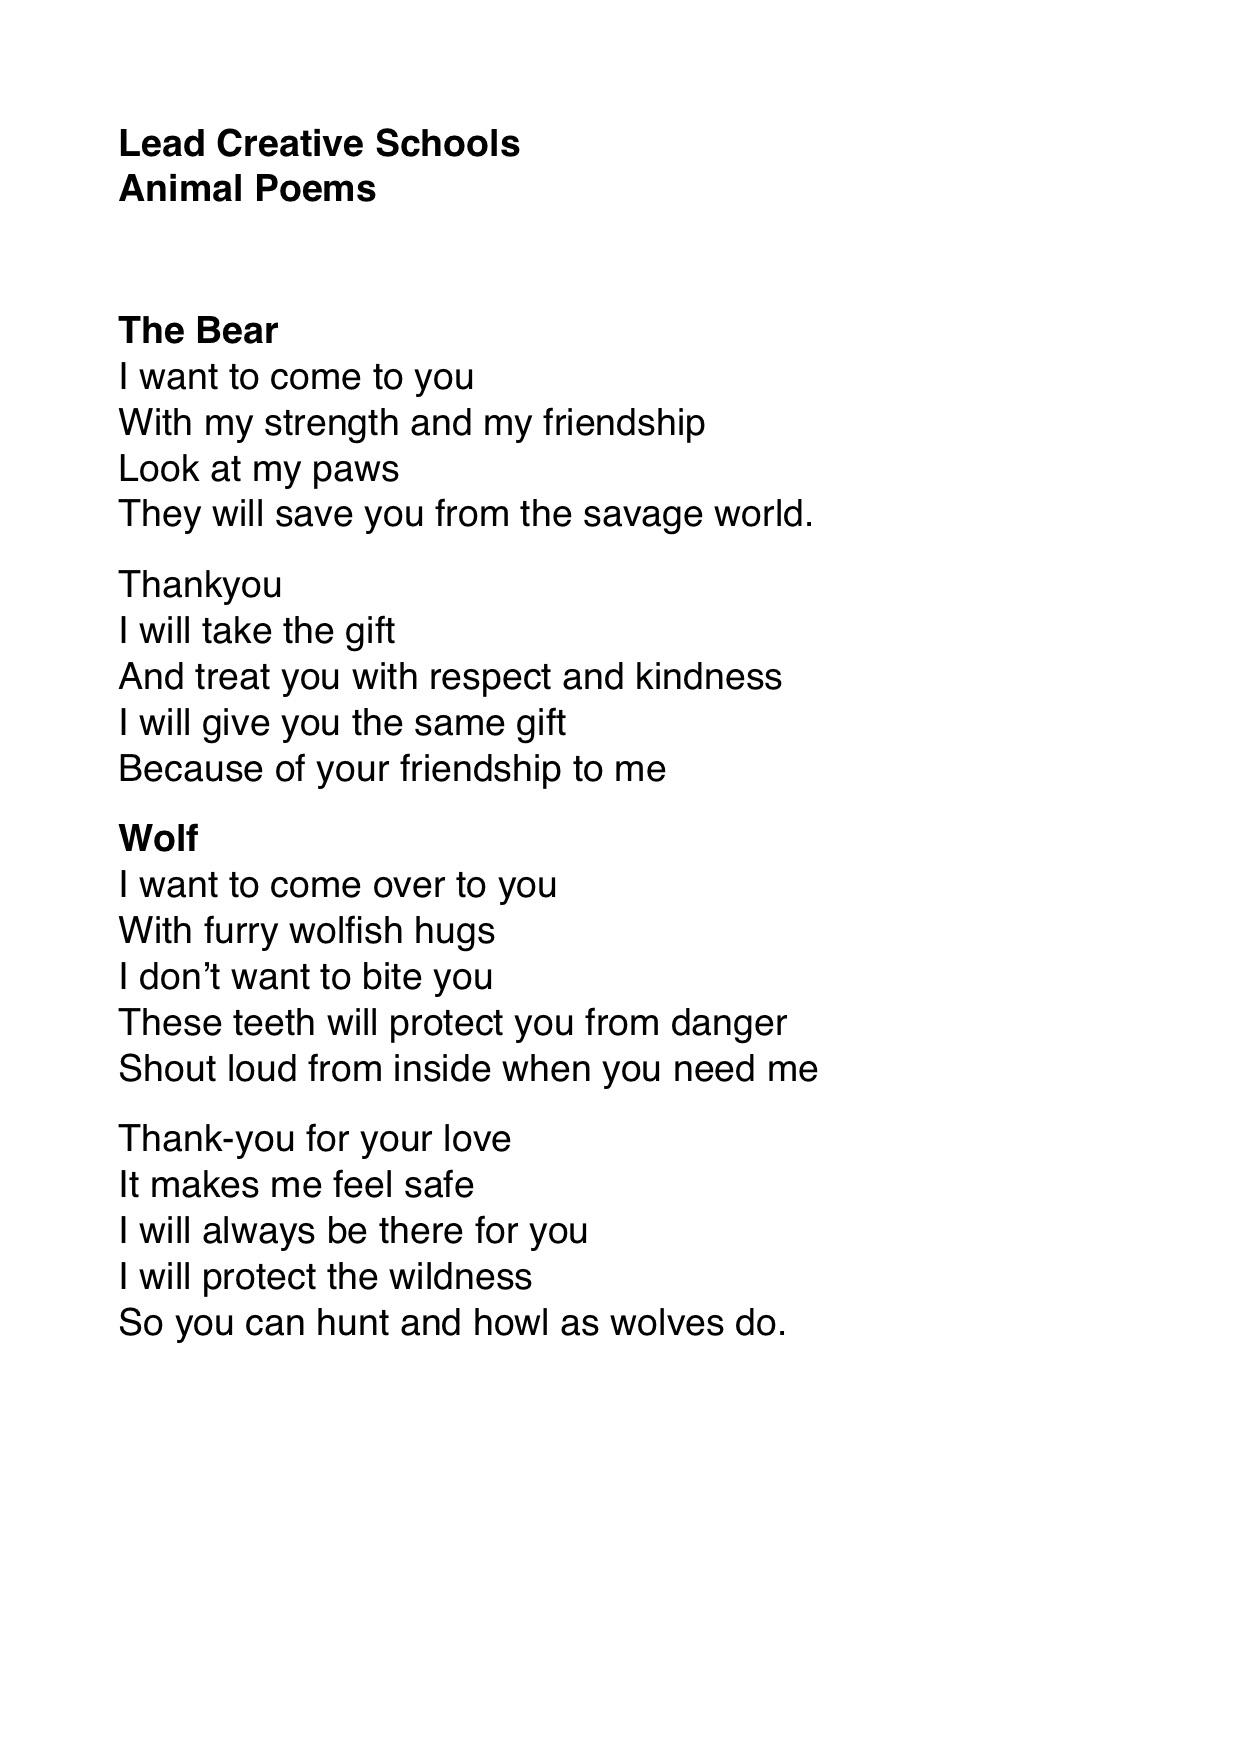 12 Bear and Wolf poems.jpg